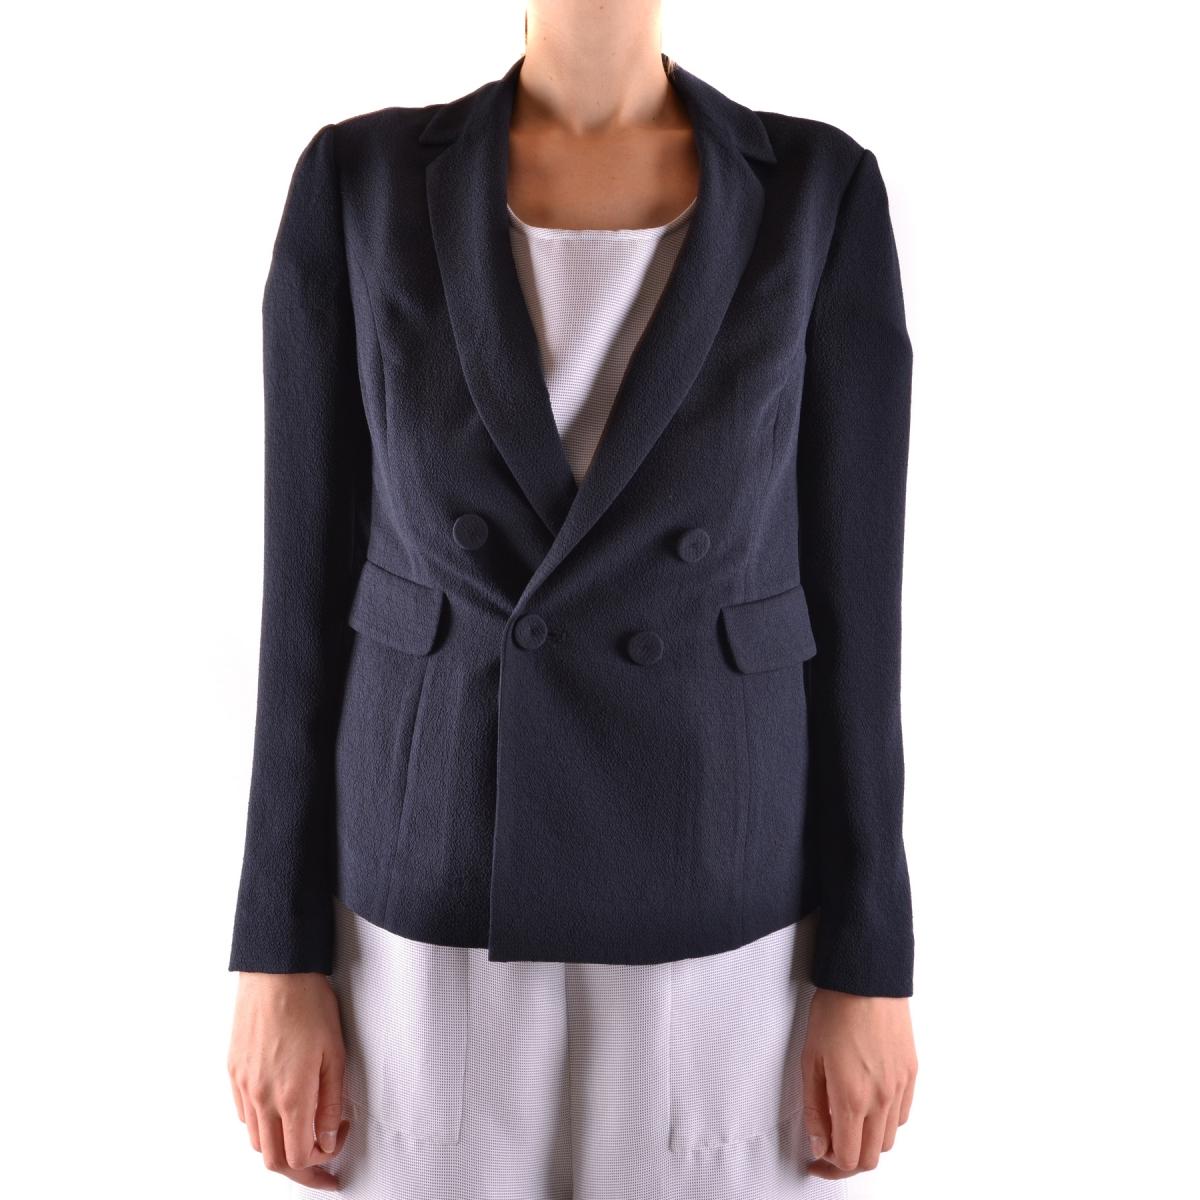 Ebay 20 Giacca Armani Jeans 30884it fgxPnT